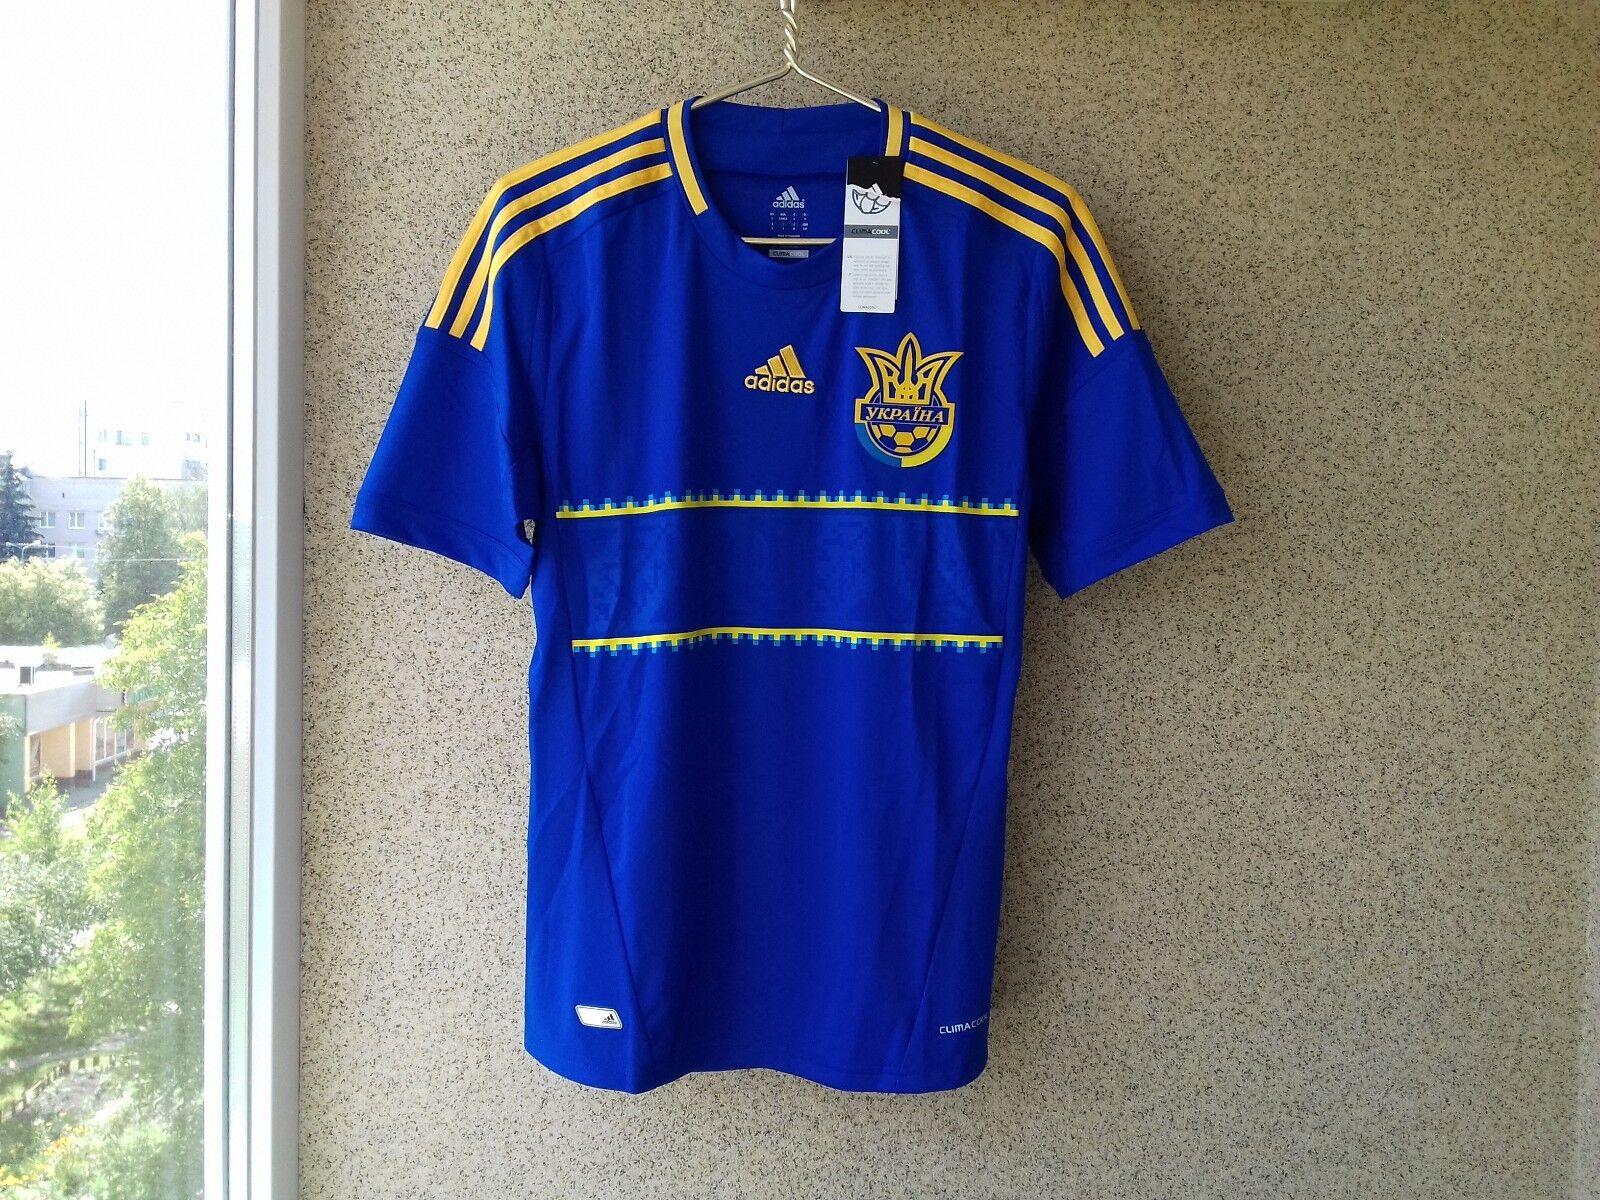 1d8b3187ab9 Ukraine Away football shirt 2012 2013 S Adidas Camiseta Soccer Jersey  nrlzrd3717-Men